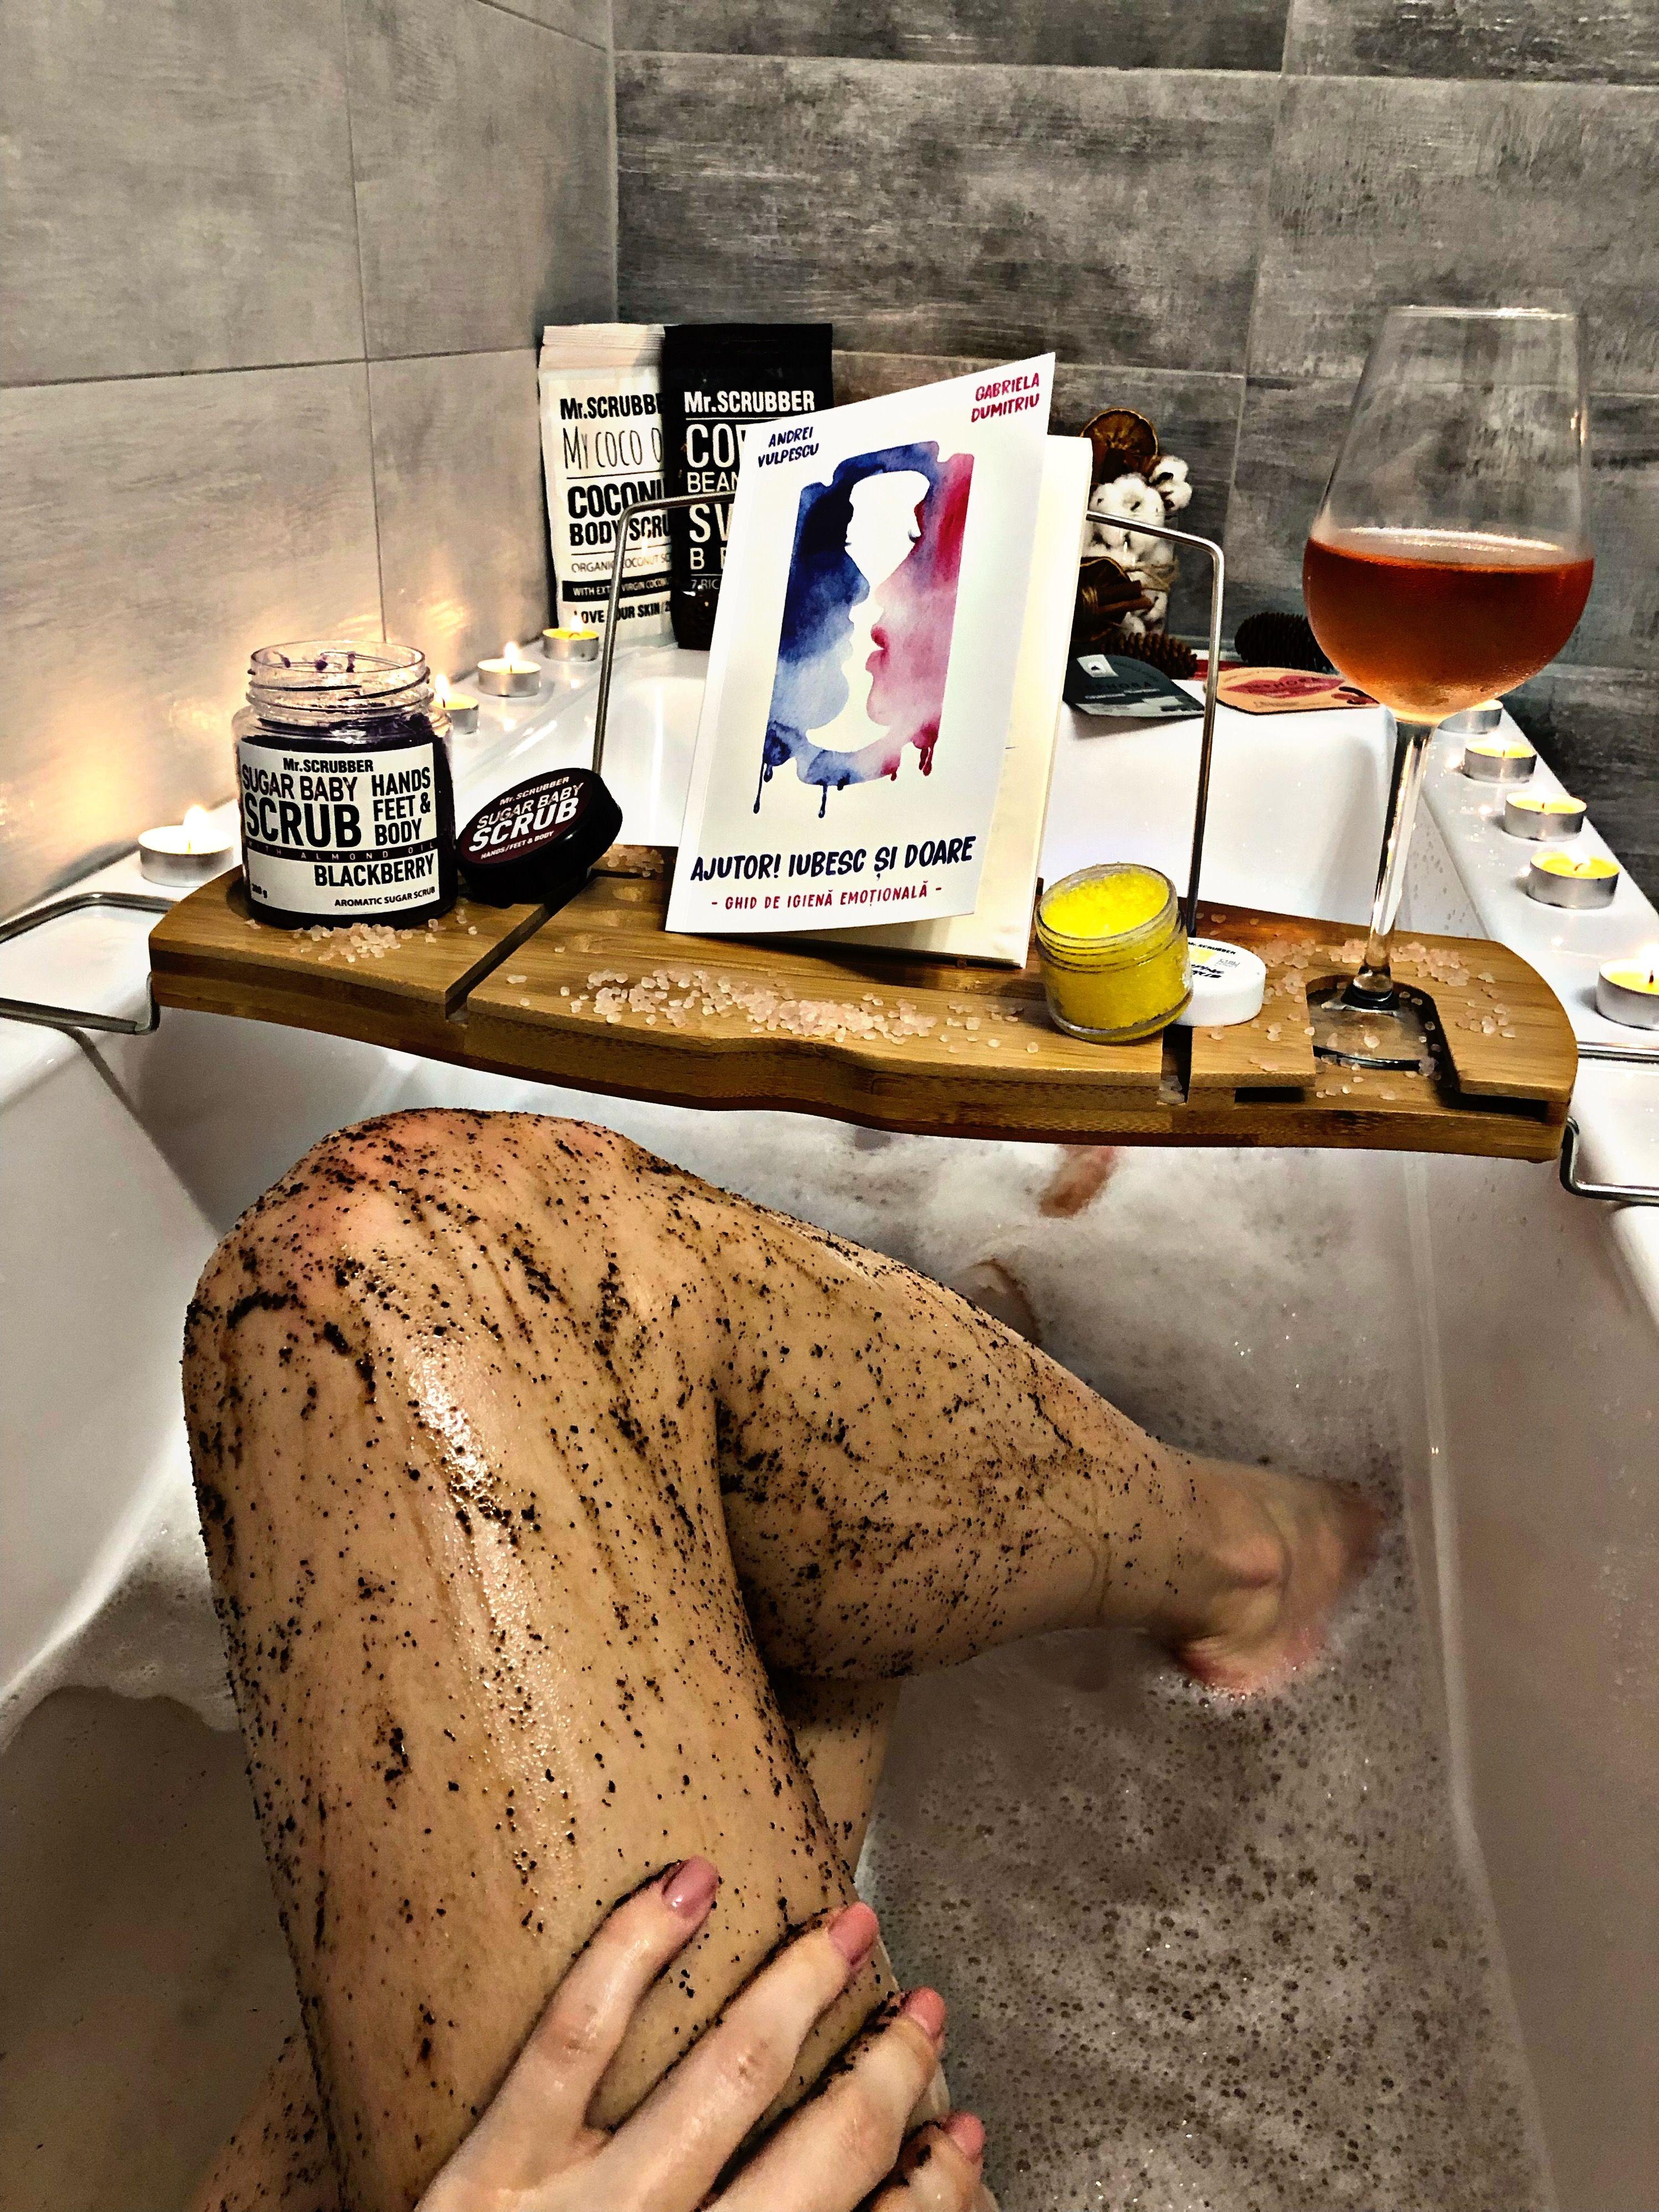 Pin by Sensy on Design living Living design, Bath caddy